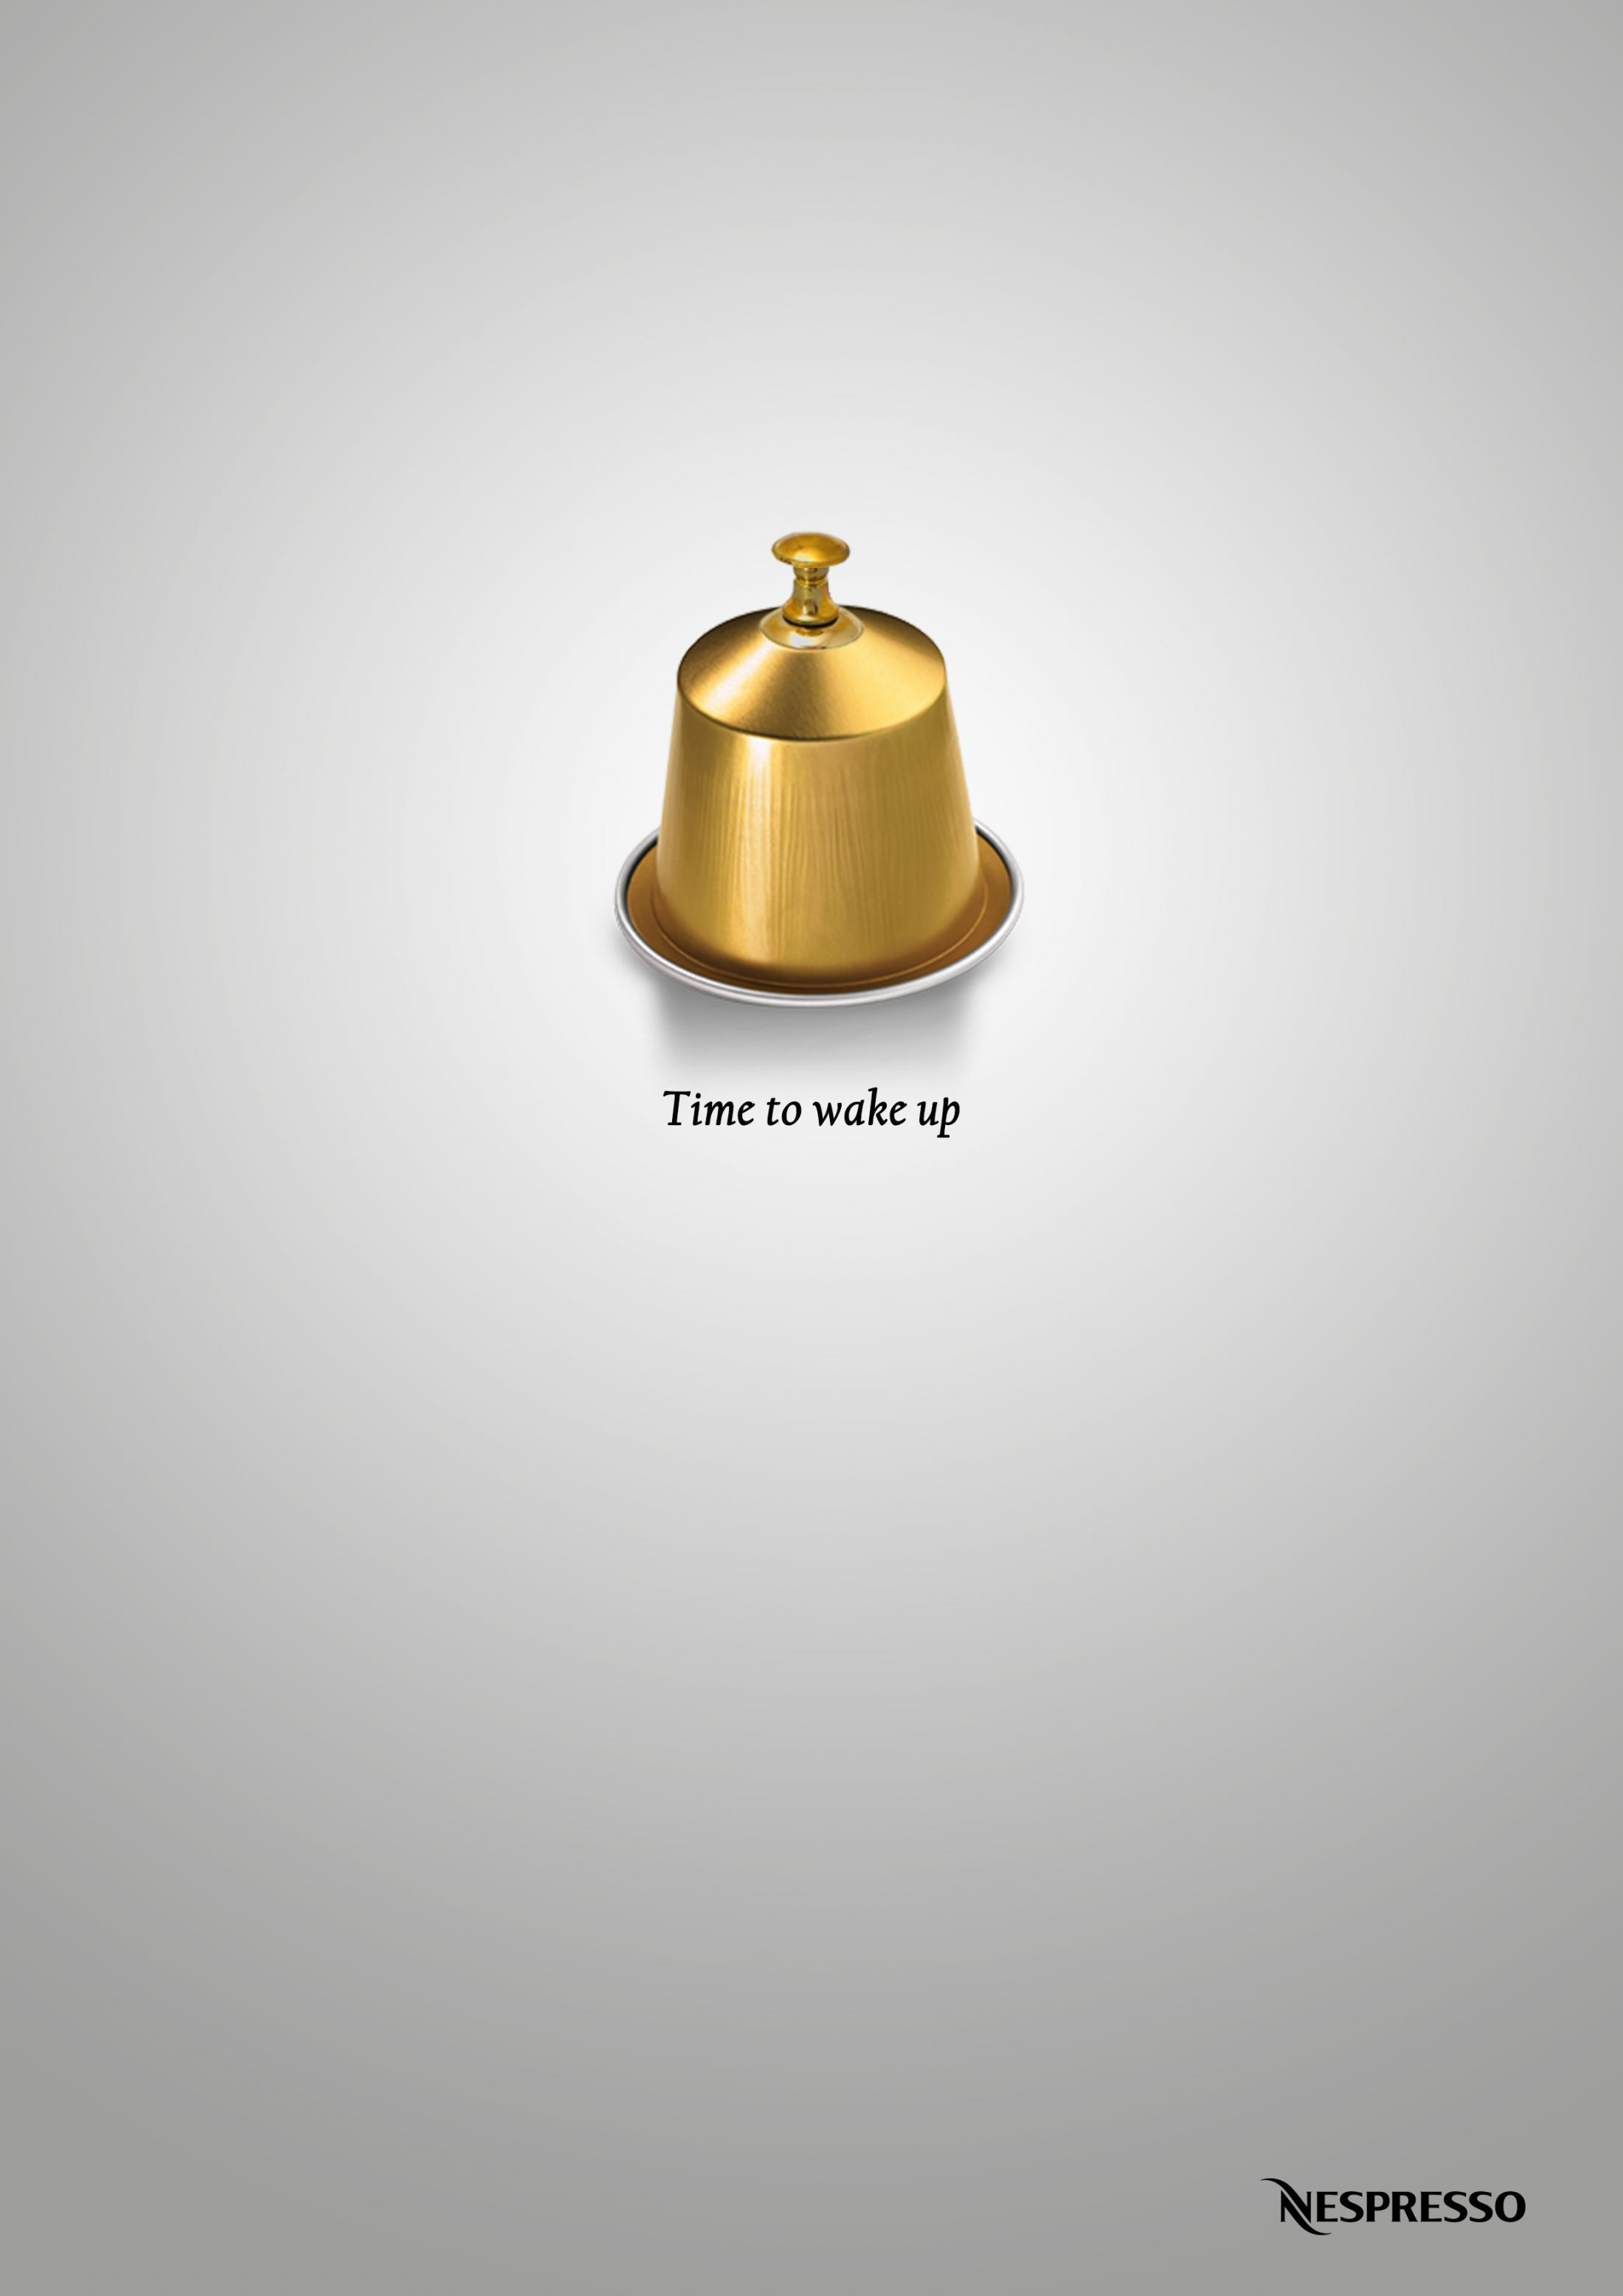 Nespresso Print Ad - Time to wake up